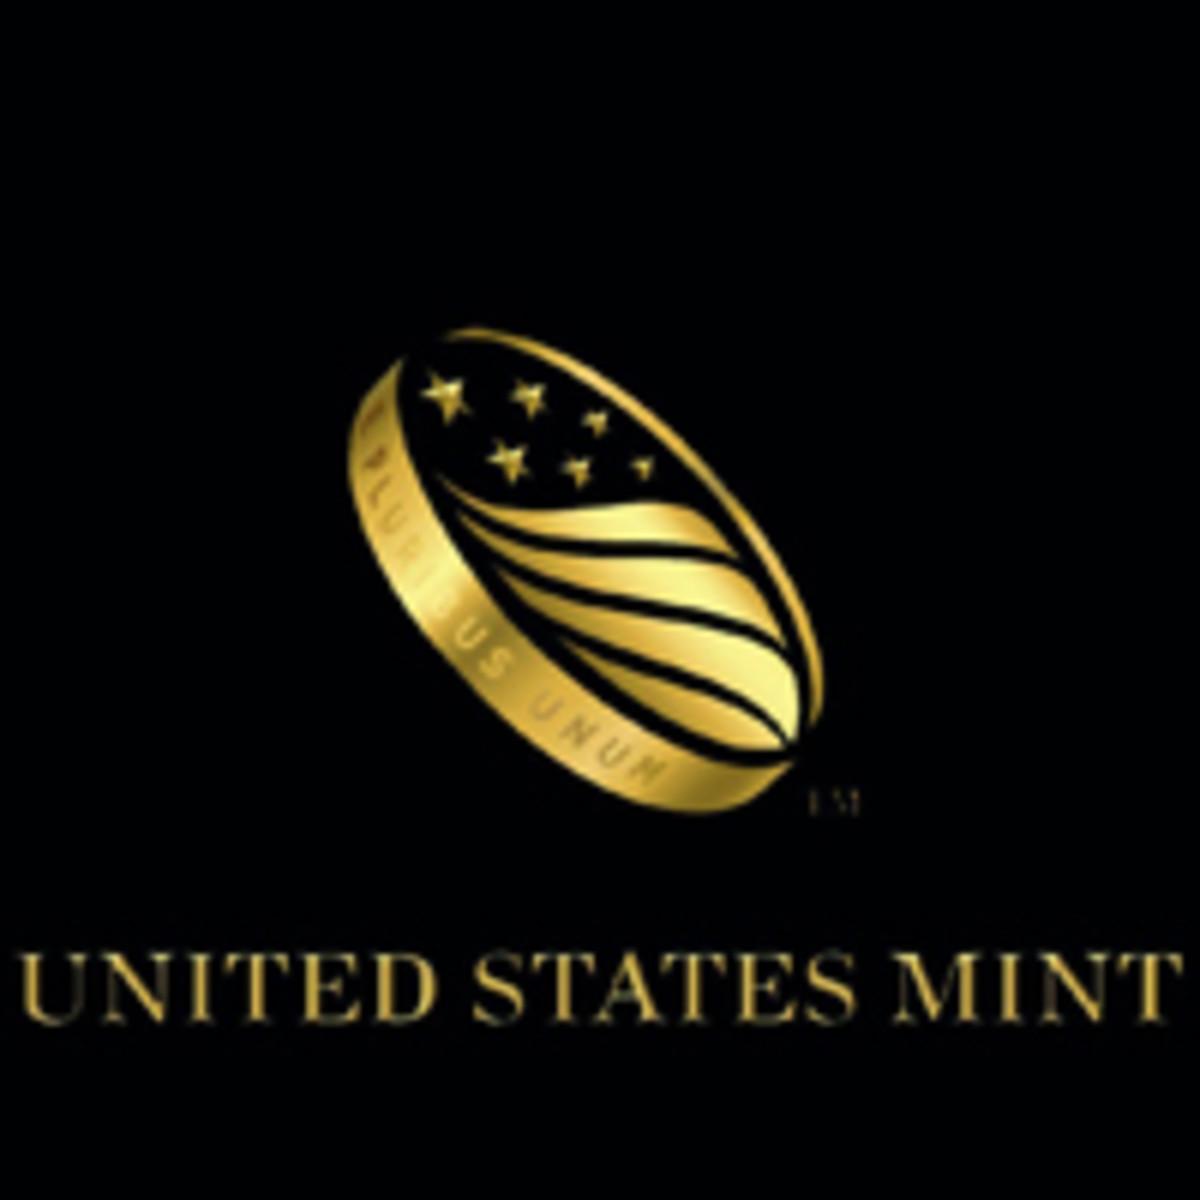 MintReturns0410